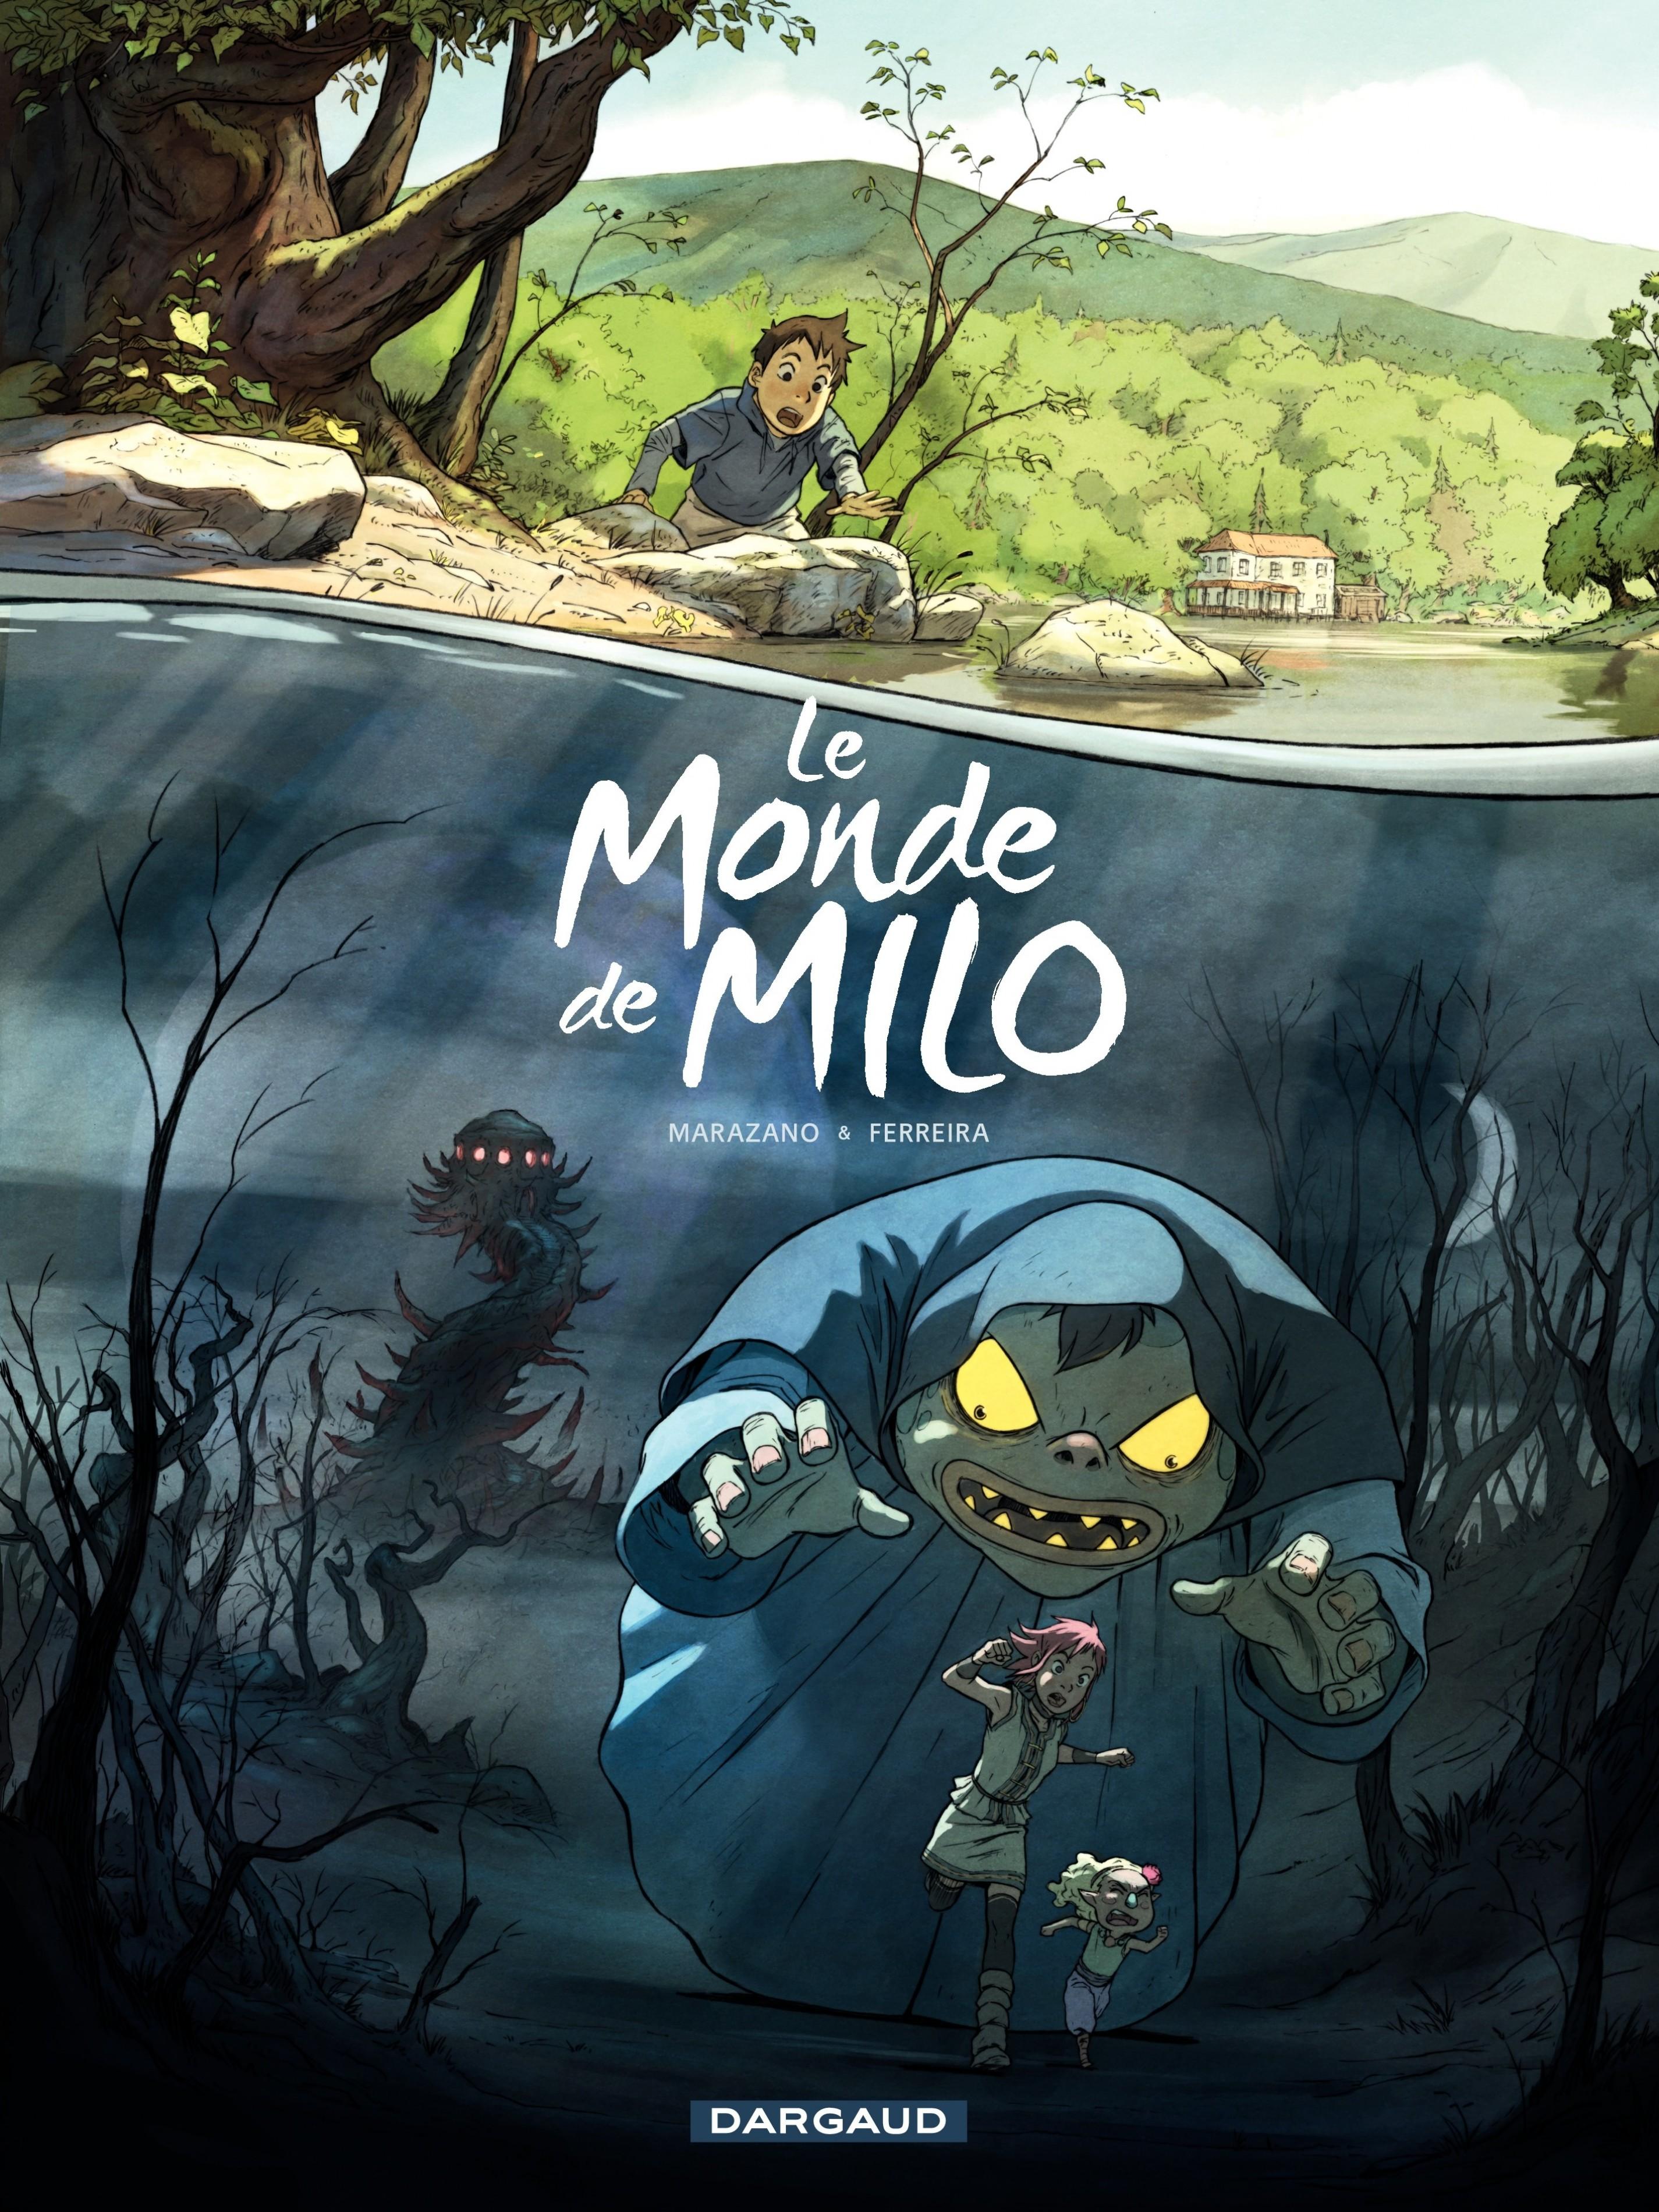 Monde de Milo (Le) - Tome 1 - Le Monde de Milo (1/2)